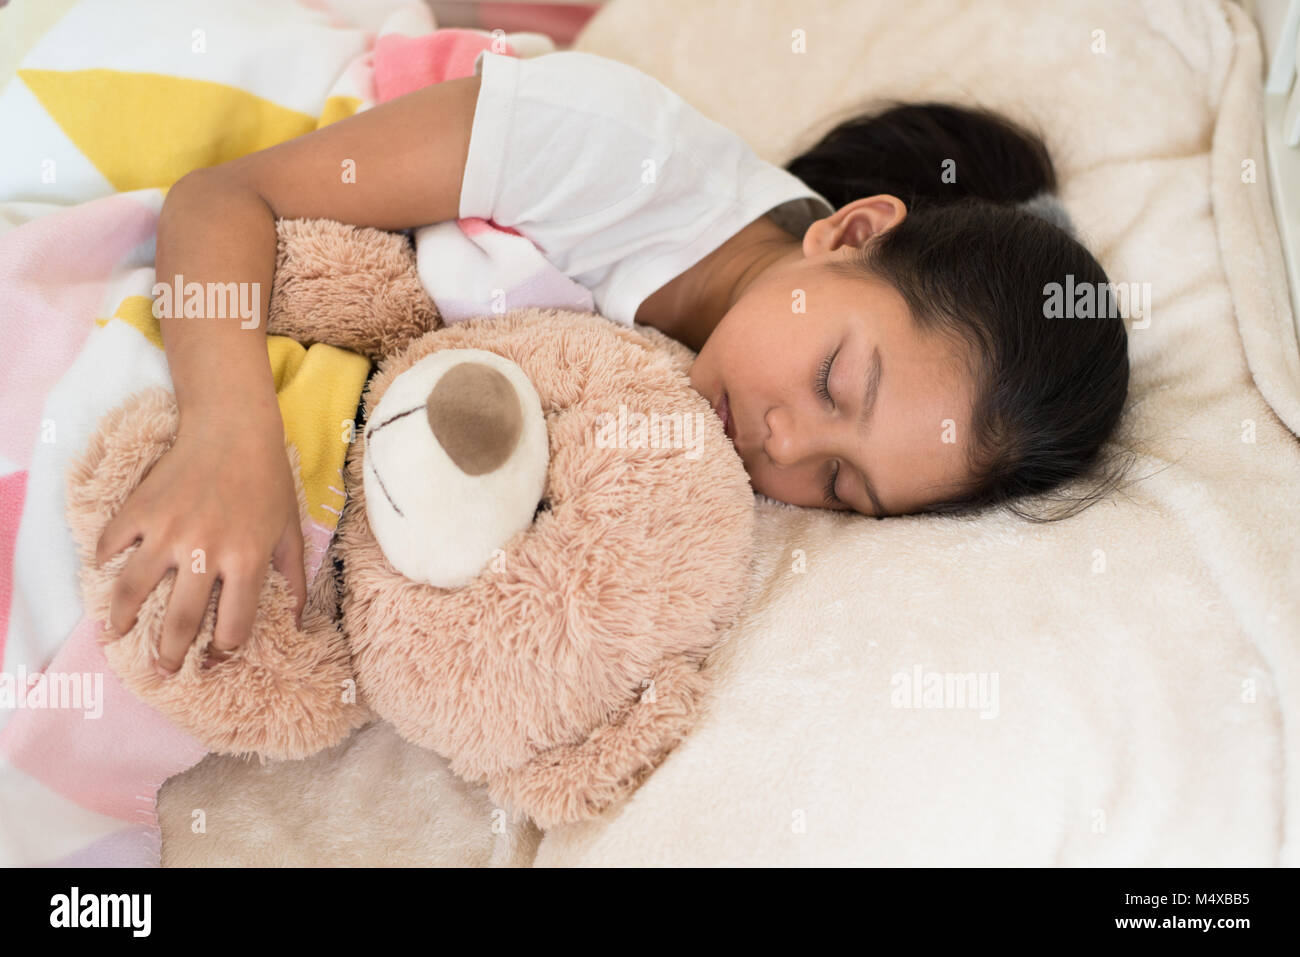 young little asian girl sleeping while hugging teddy bear. sleep concept - Stock Image